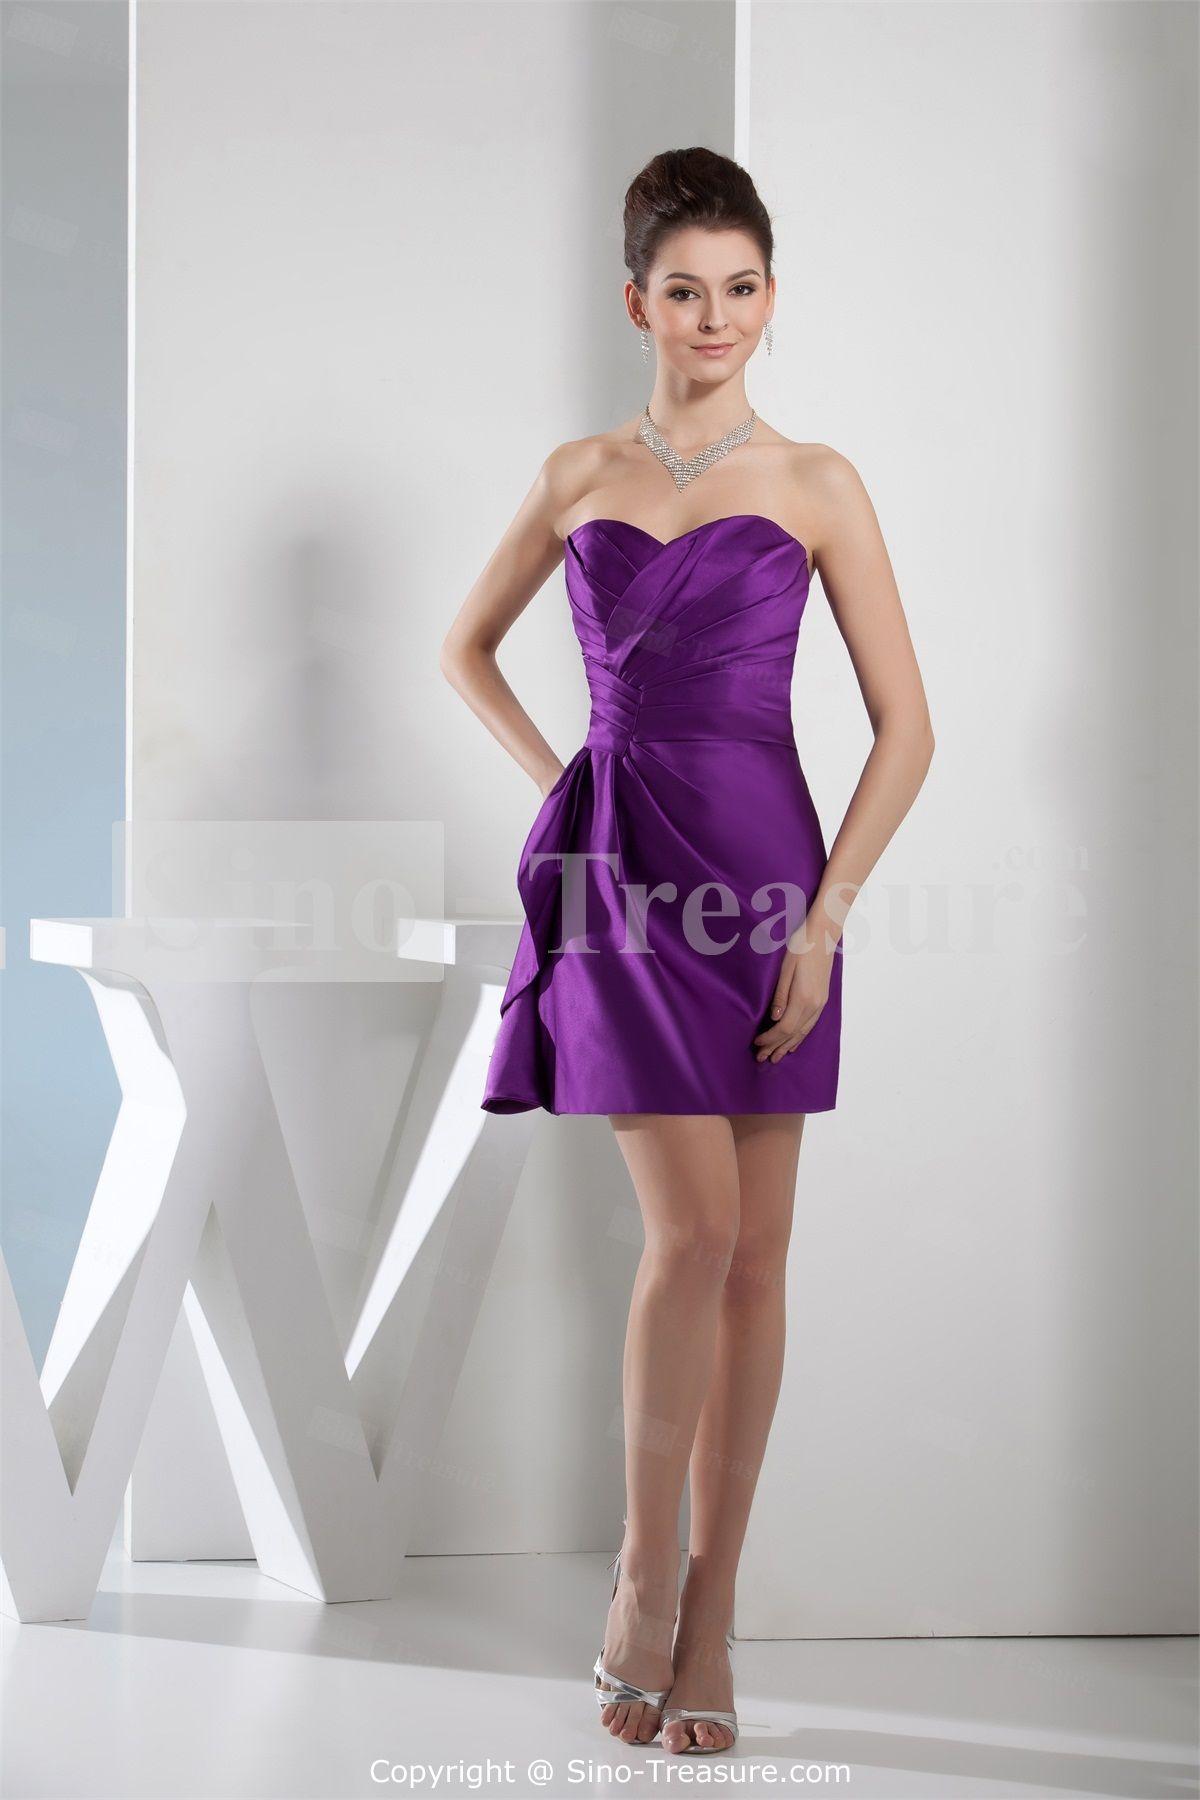 Silky short purple bridesmaid dresses dress images silky short purple bridesmaid dresses ombrellifo Choice Image